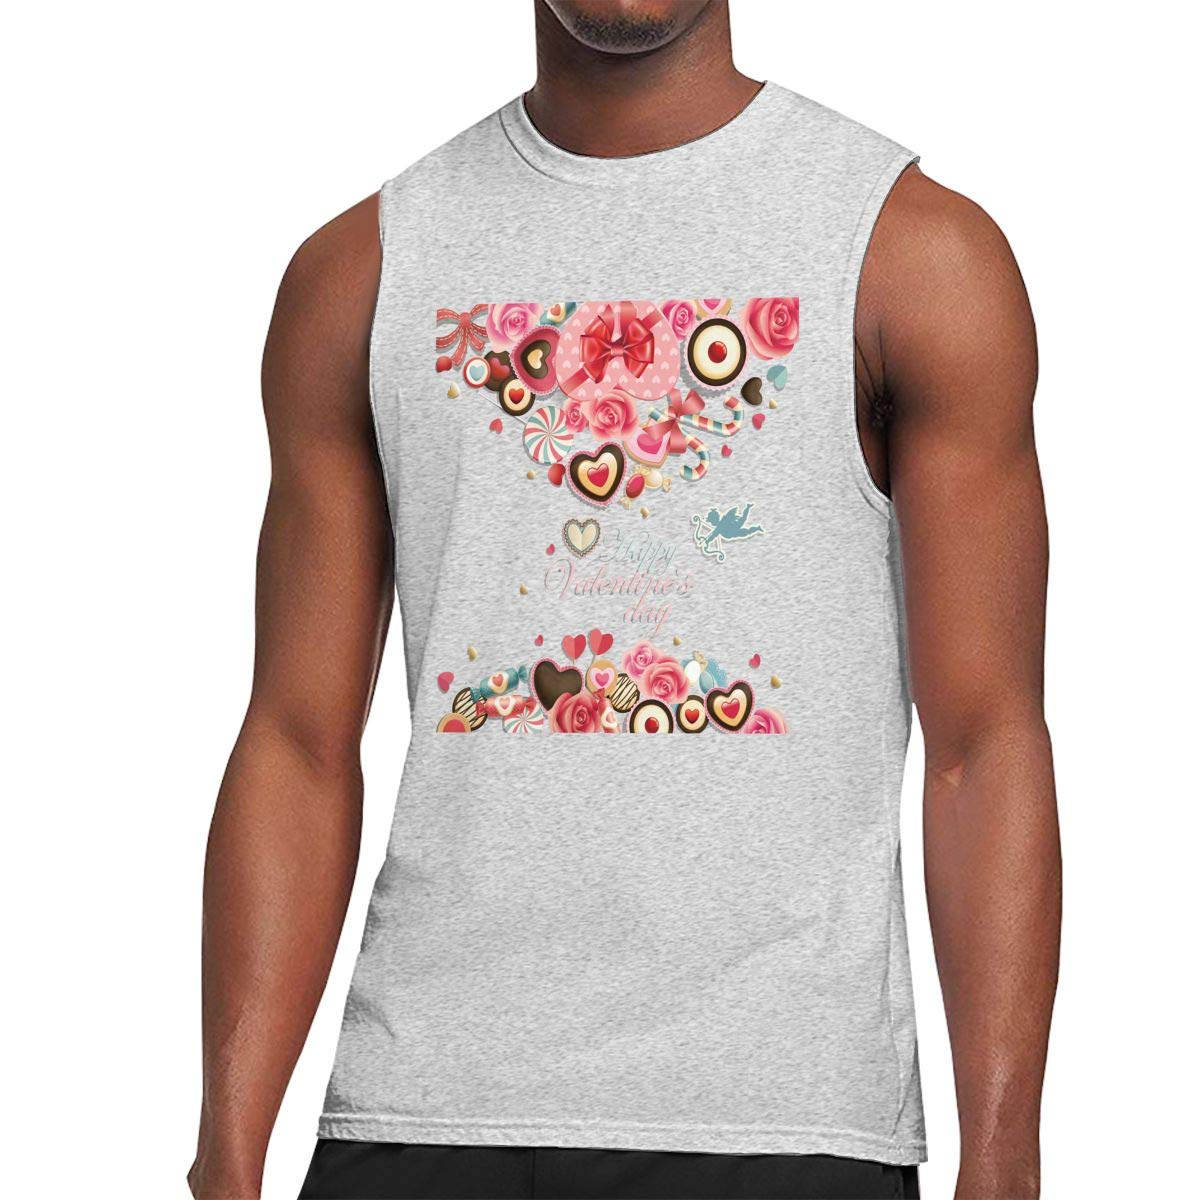 S Muscle Tank Top Softball Valentines Day Love Gym Trainingtech Running Activewear Shirts